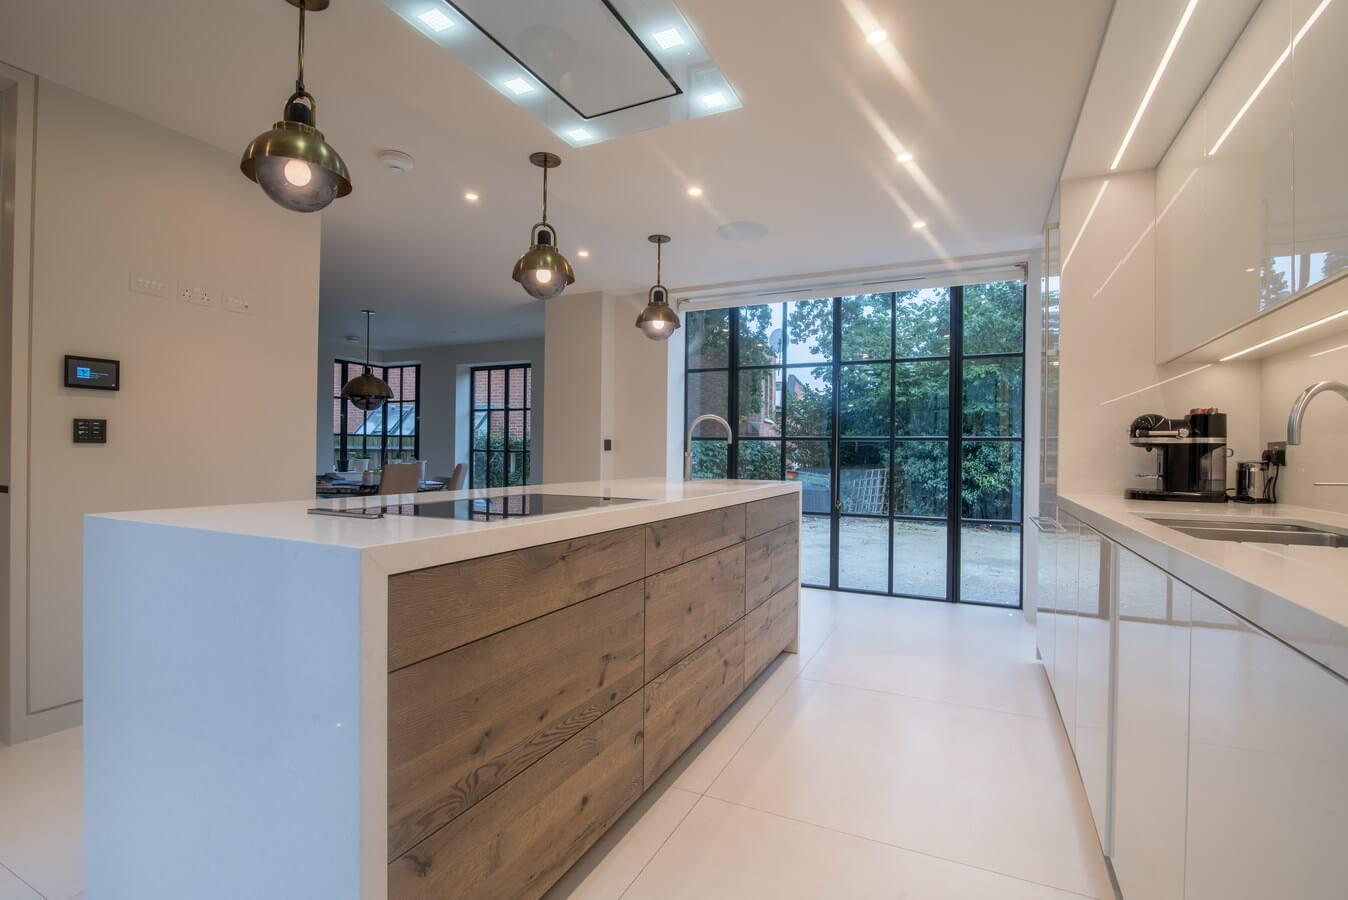 Hampstead-German-Kitchen-London-White-Real-Wood.jpg